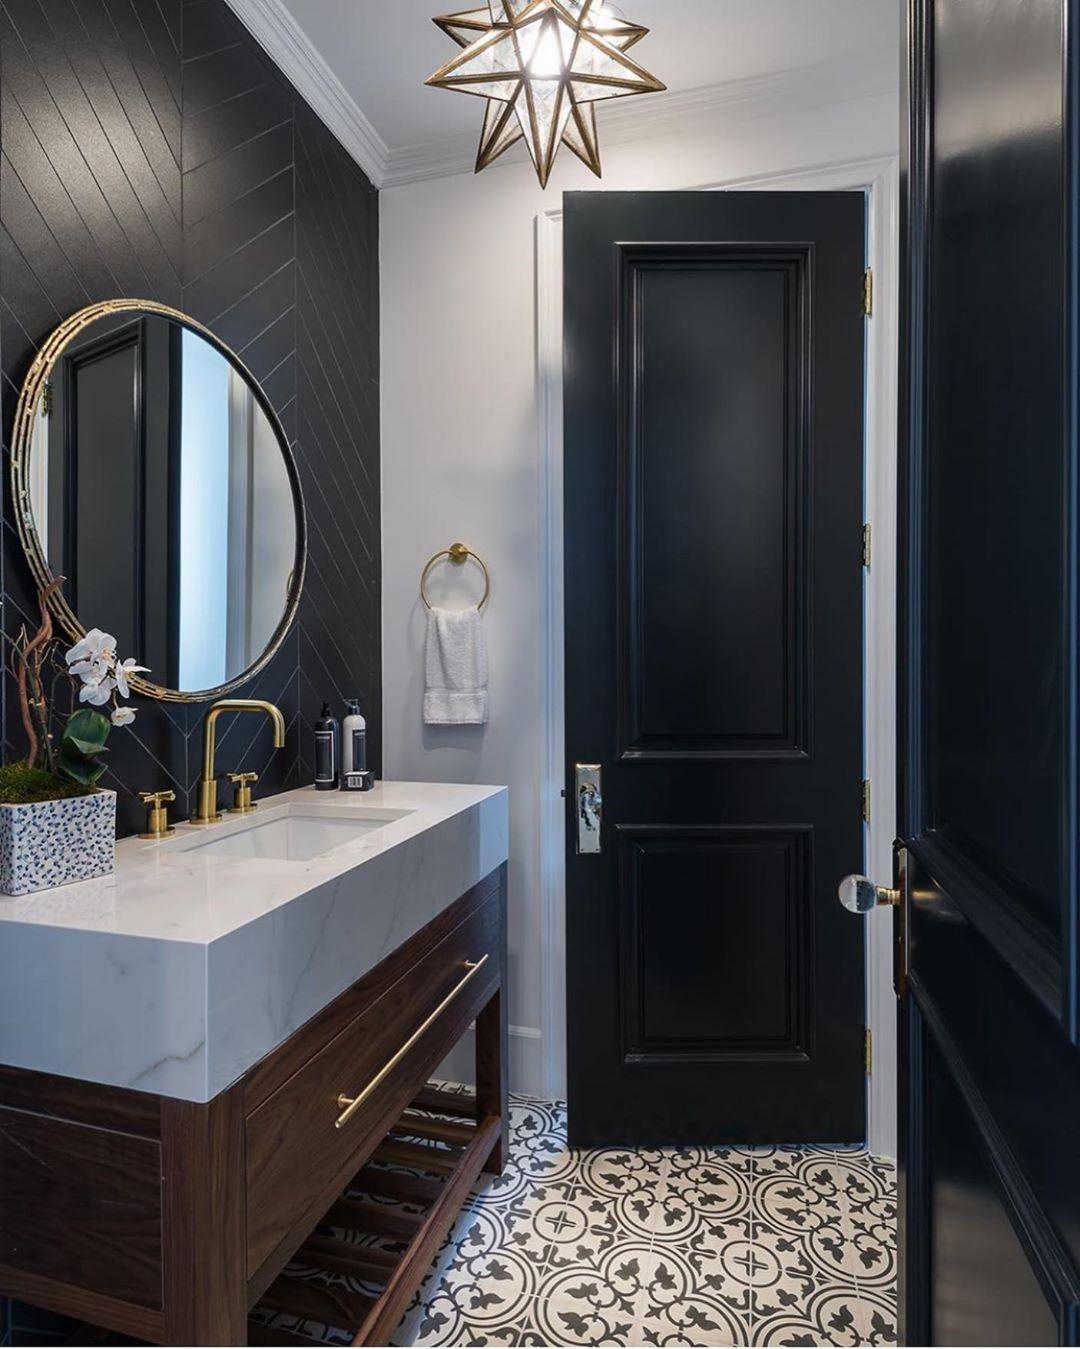 Bathroom Design Ideas Black And White Tiles Bathroom Black Marble Bathroom Luxury Powder Room